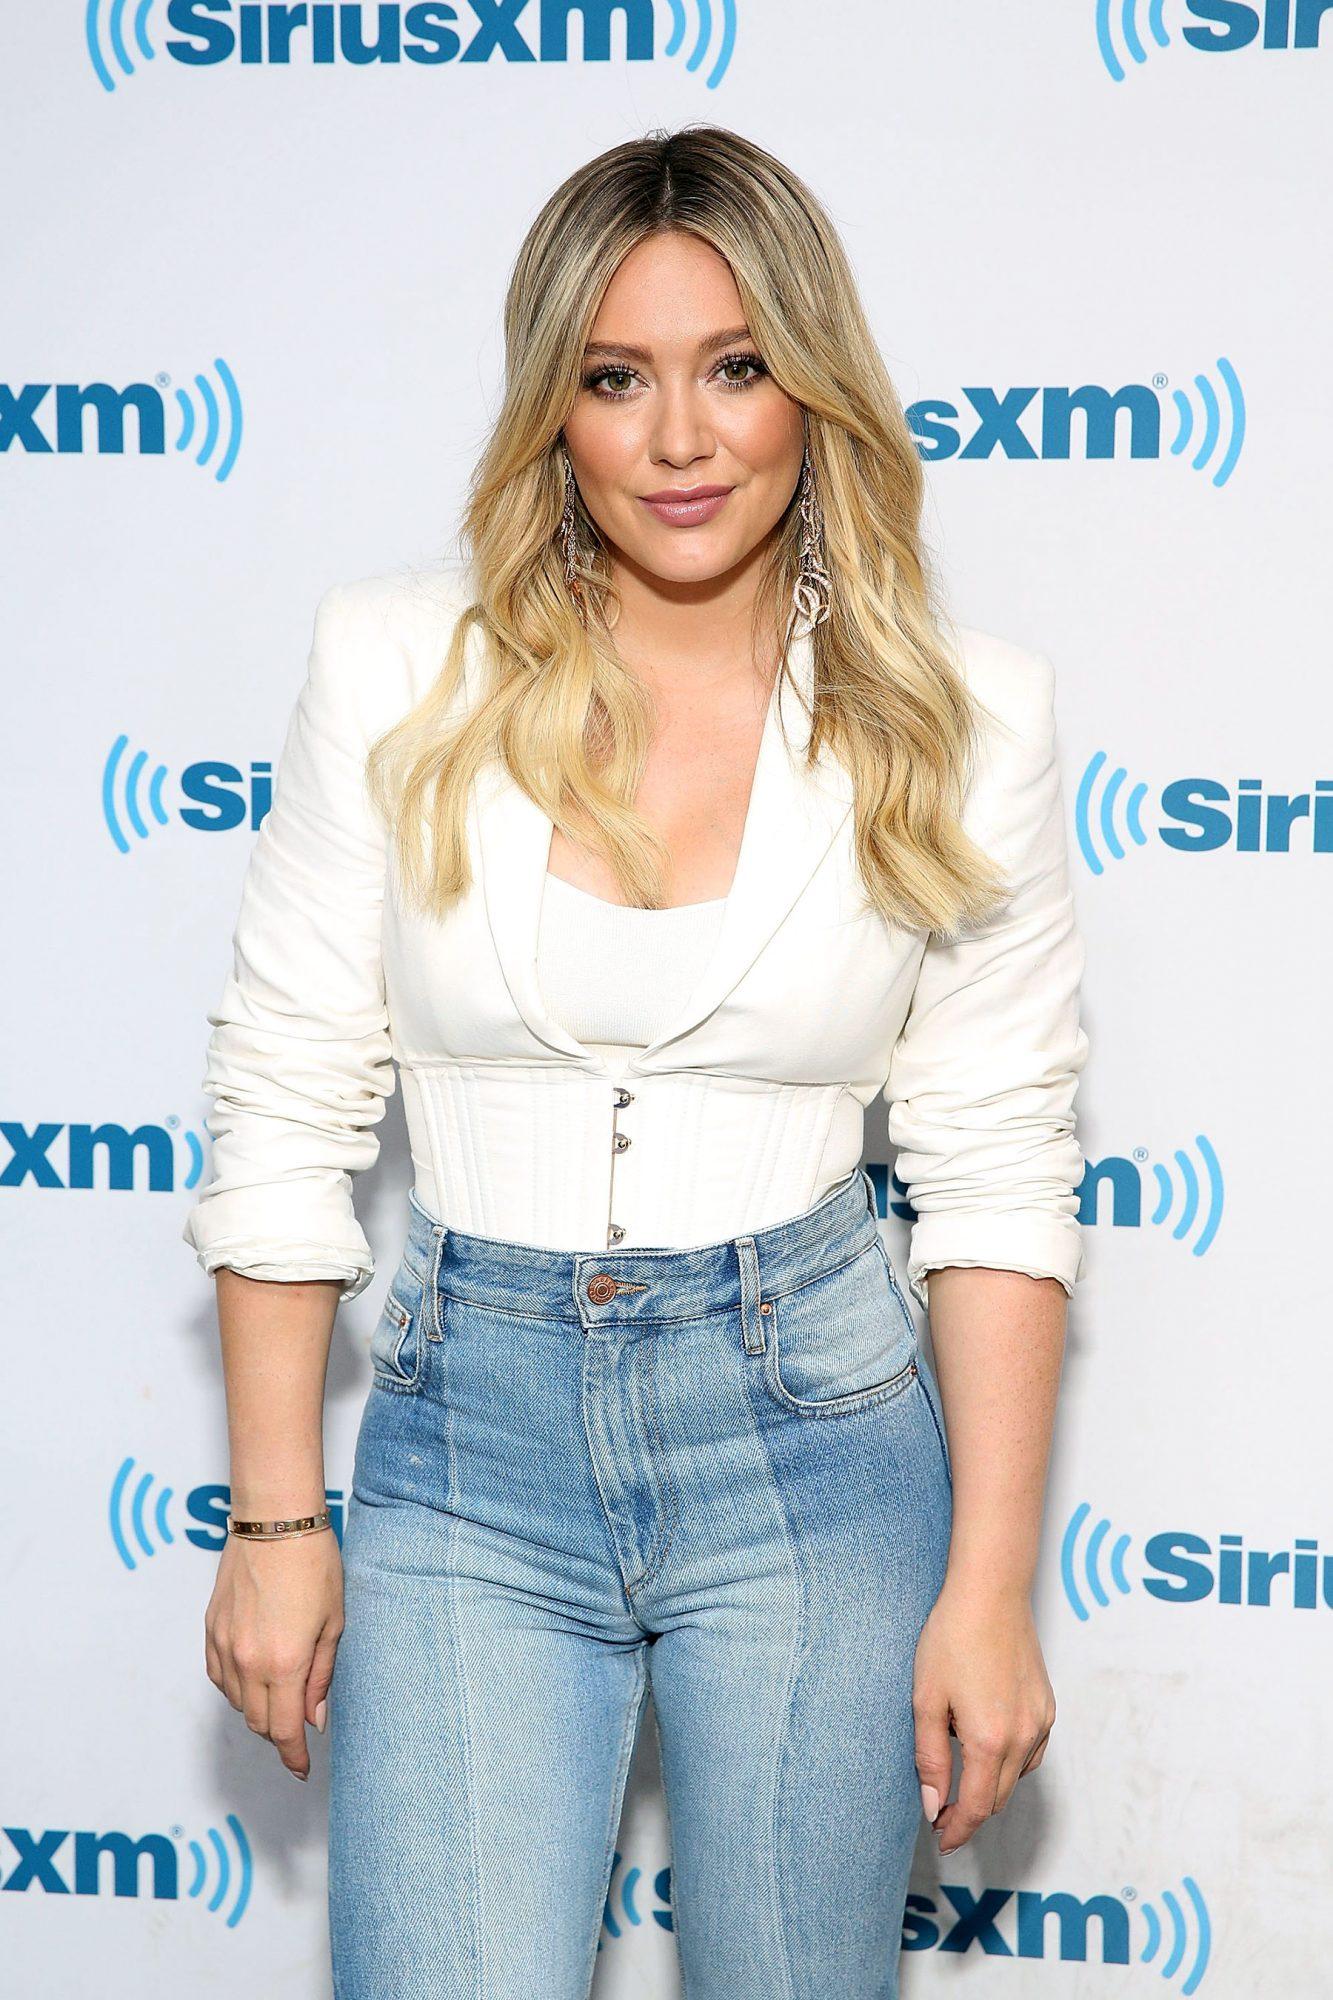 Celebrities Visit SiriusXM - June 27, 2017